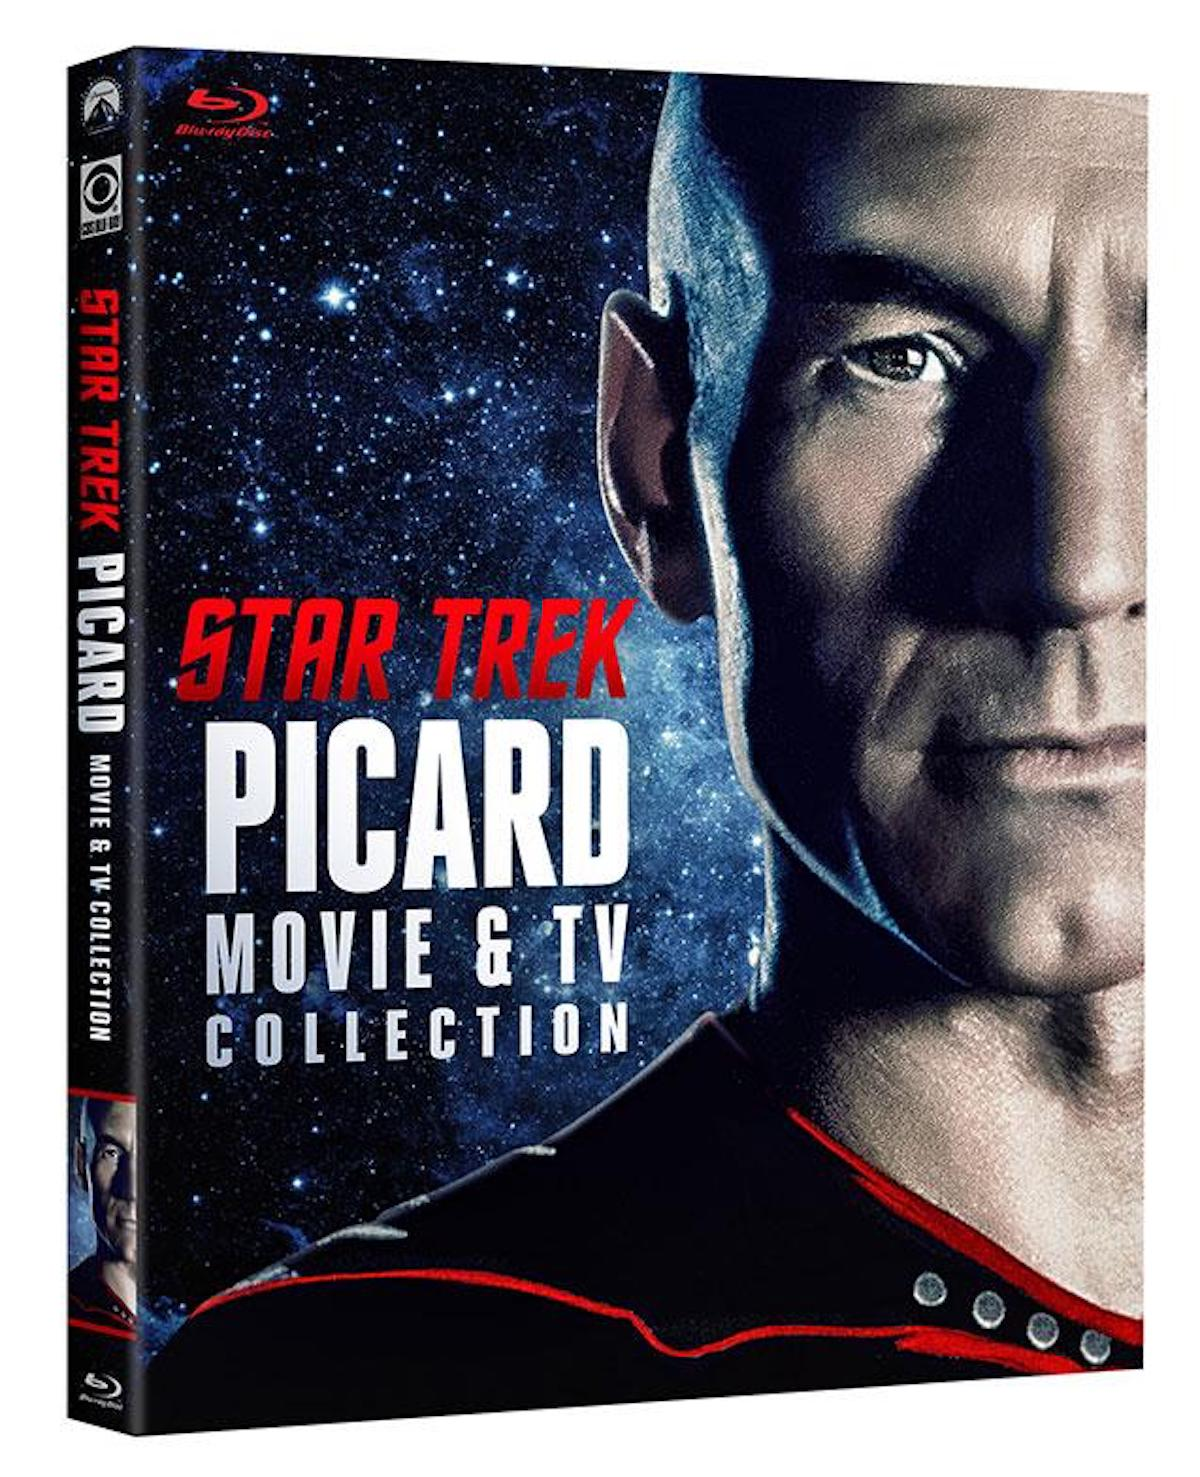 The Star Trek Picard Movie & TV Collection, StarTrek.com